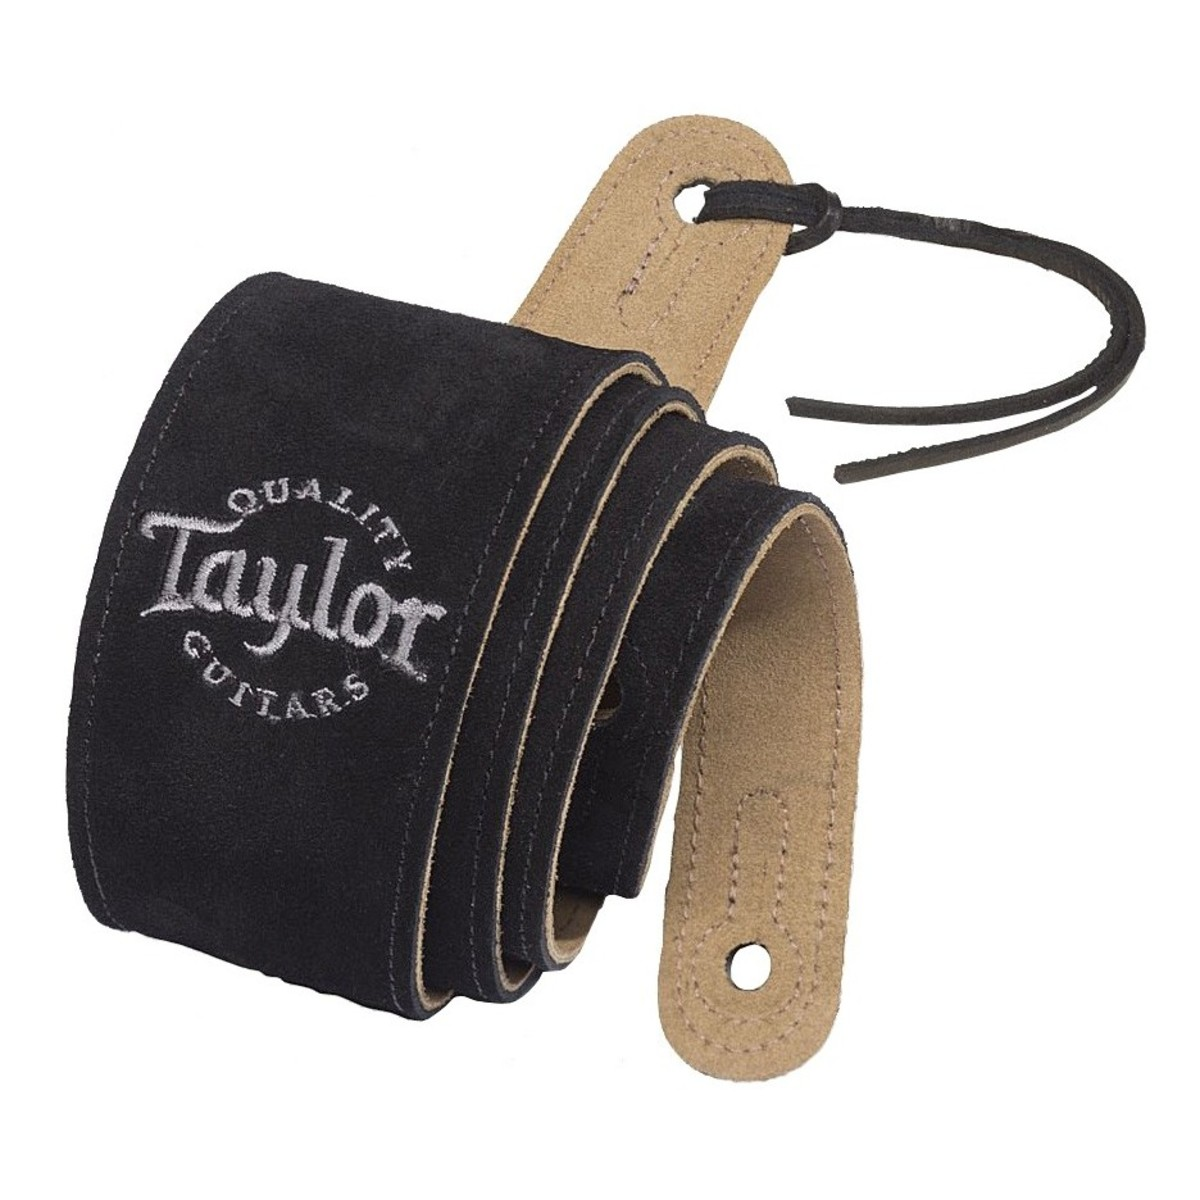 Taylor Logo Suede Guitar Strap Black At Gear4music